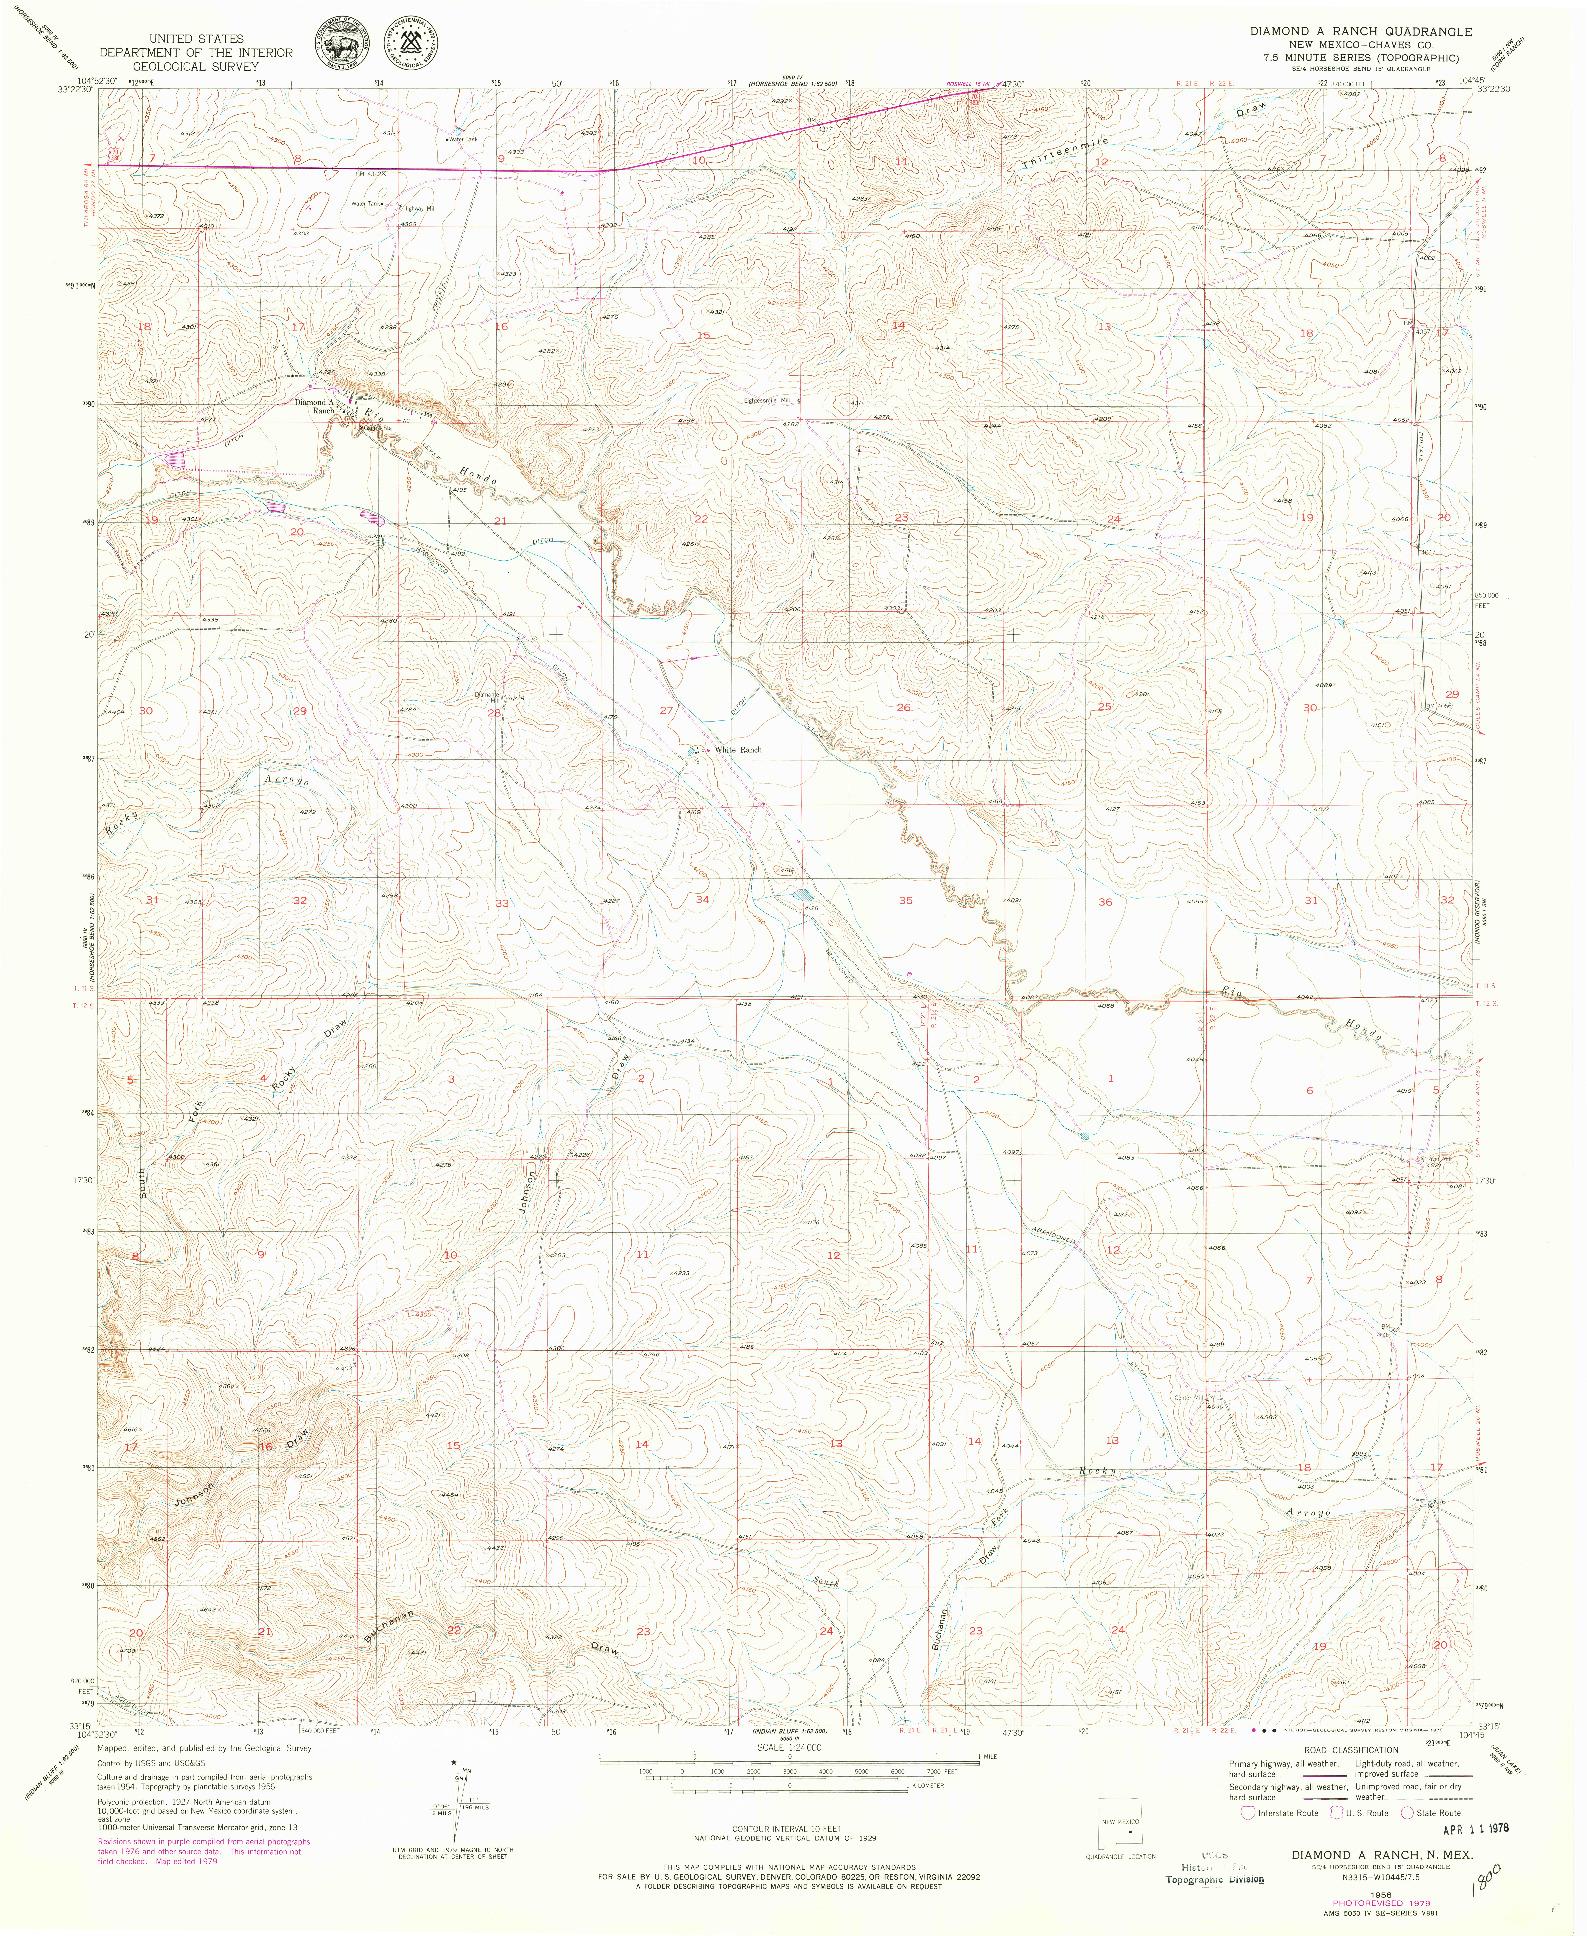 USGS 1:24000-SCALE QUADRANGLE FOR DIAMOND A RANCH, NM 1956